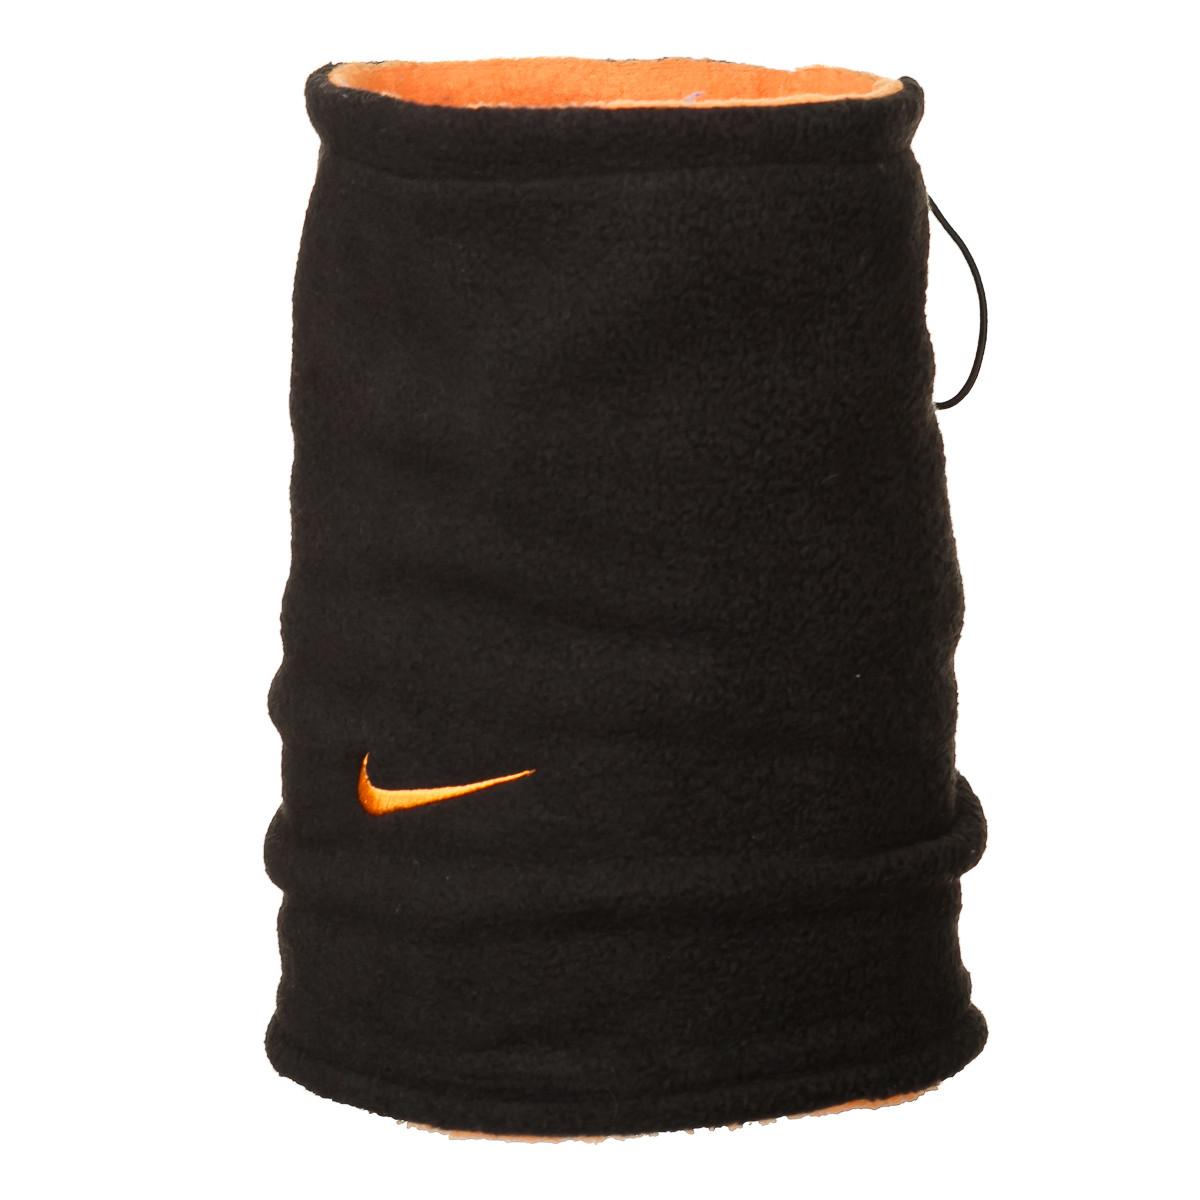 Двусторонний горловик (утепленный) Nike черно-оранжевый